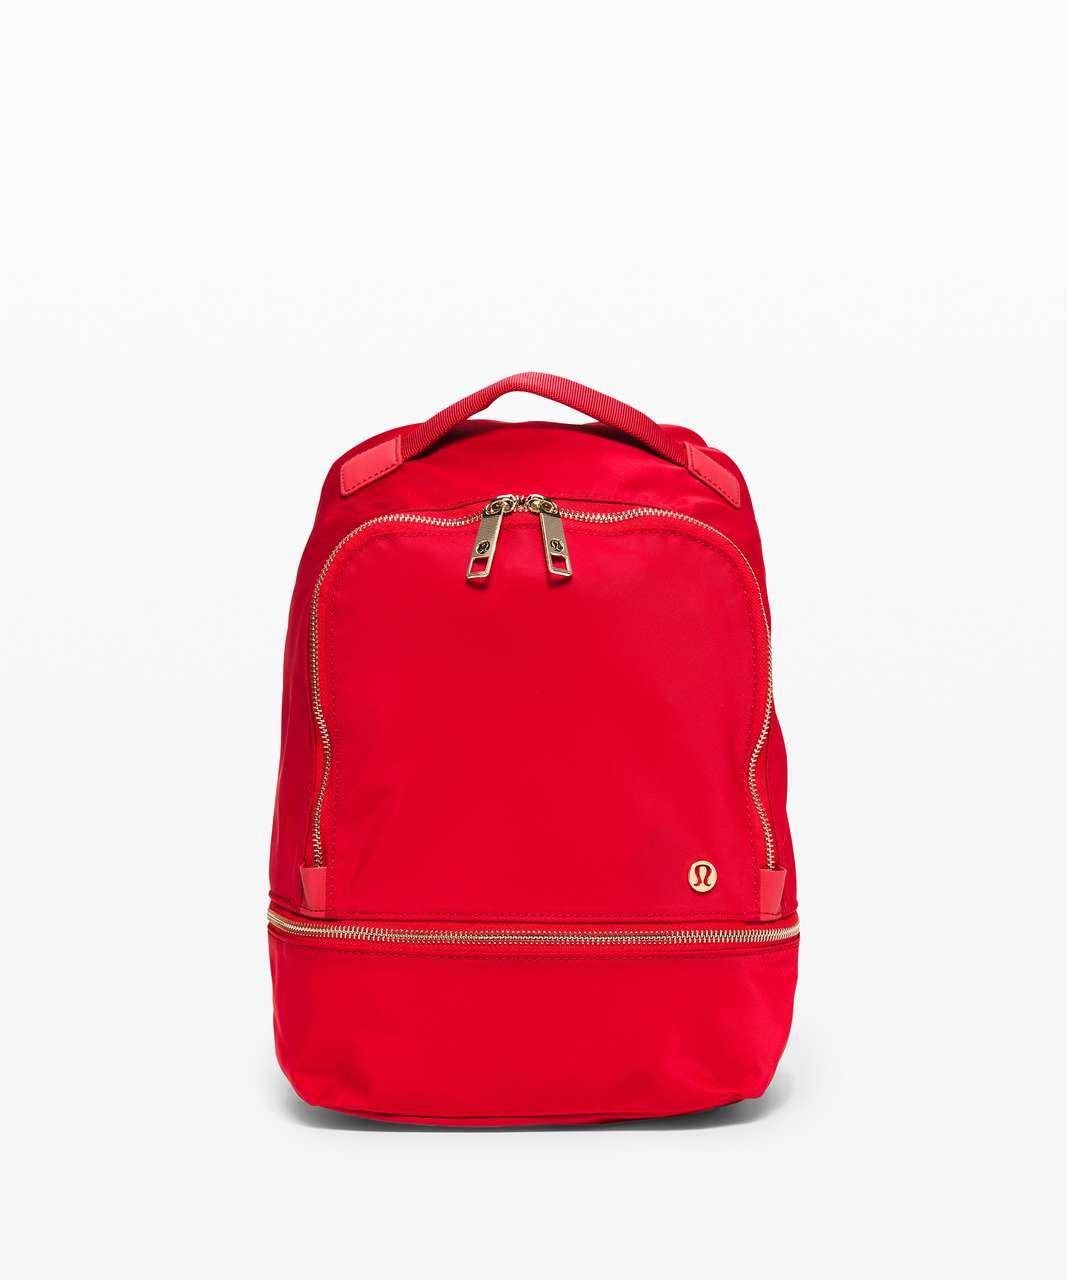 Lululemon City Adventurer Backpack Mini 10L *Lunar New Year - Dark Red